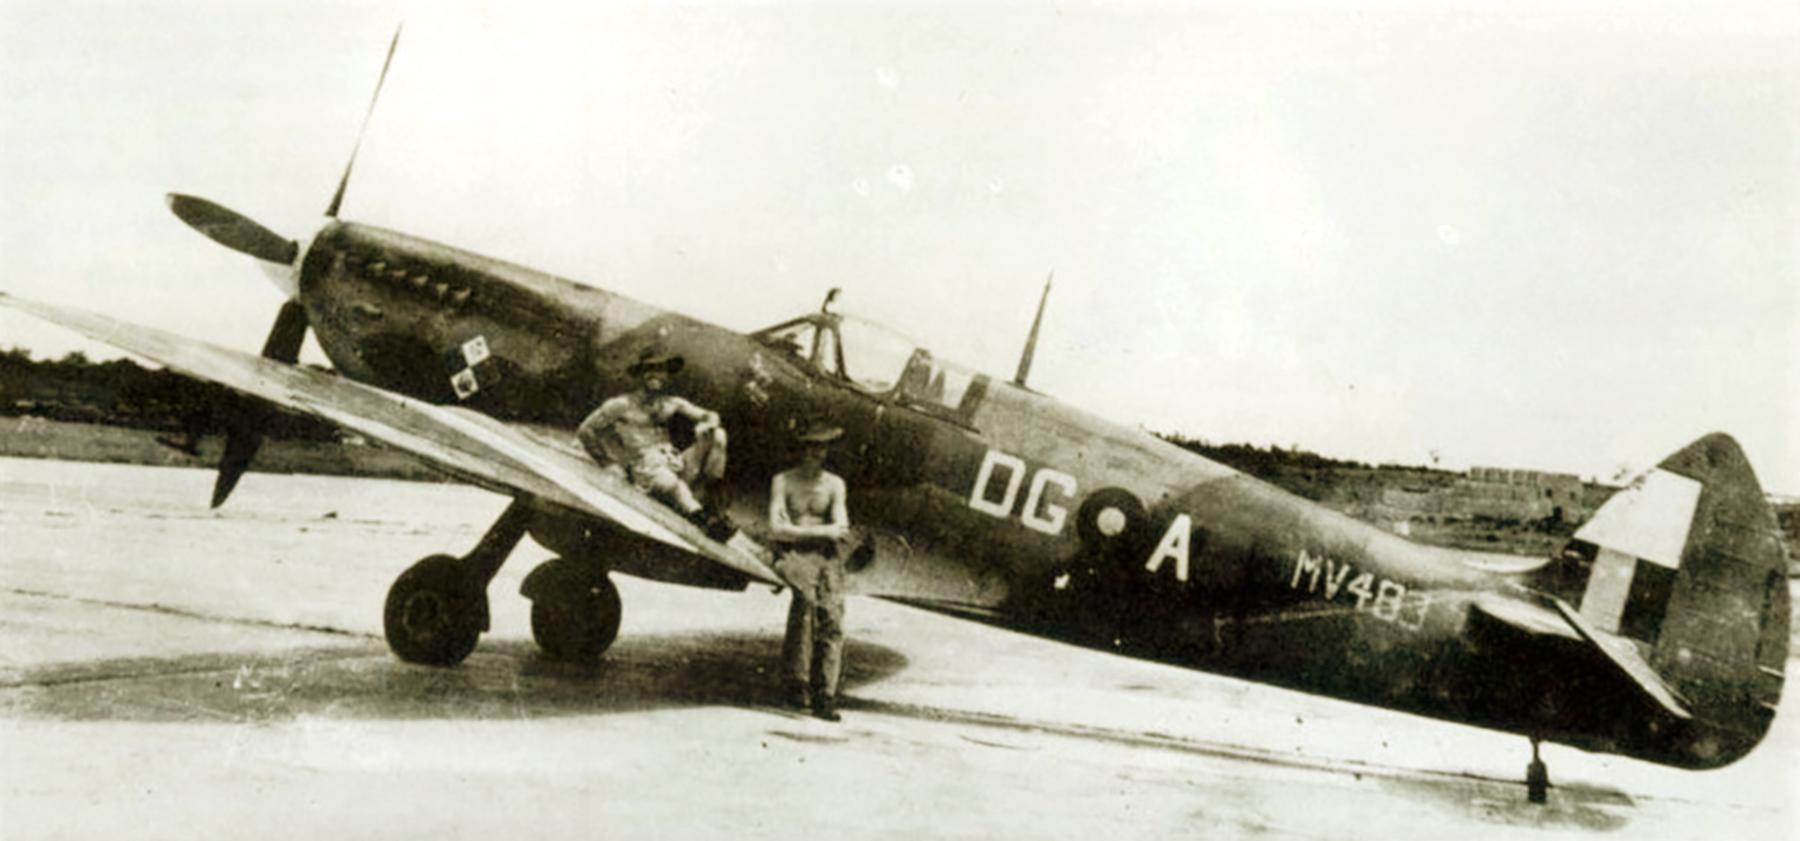 Spitfire MkVIII RAF 155Sqn DGA MV483 Burma 1945 01